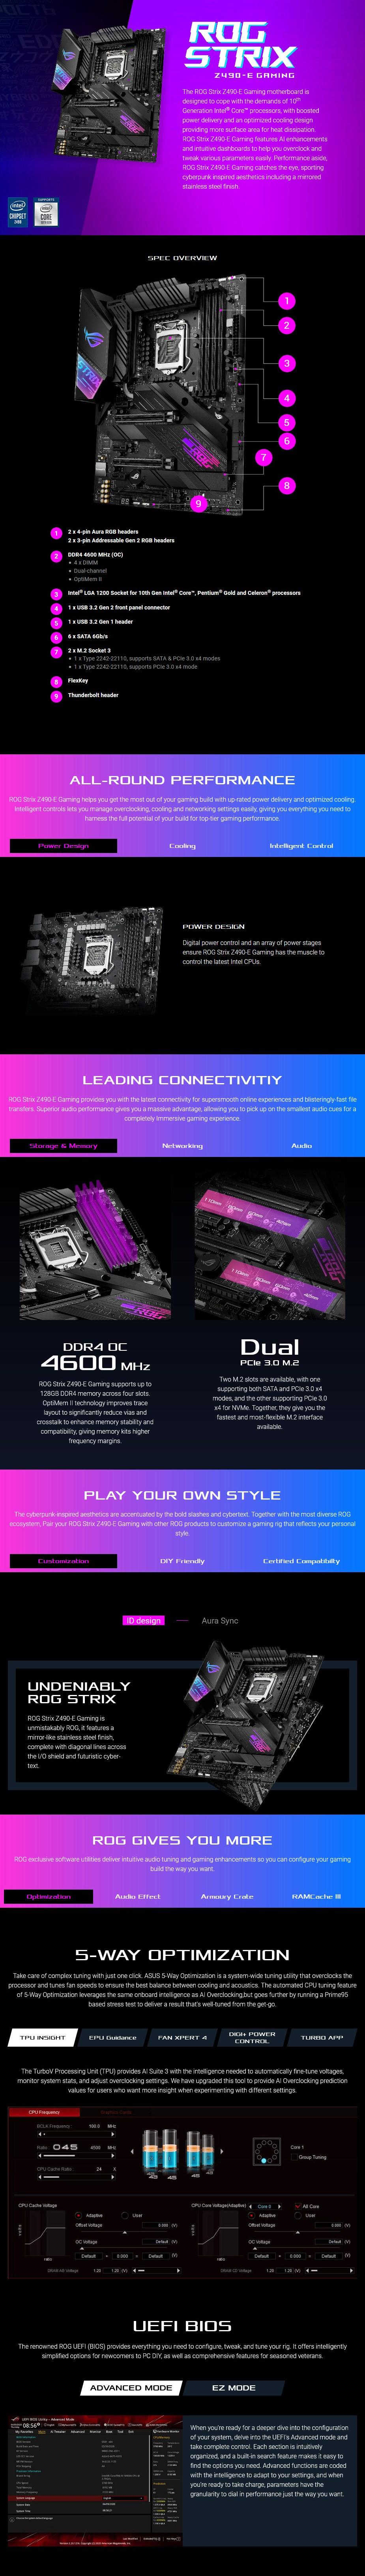 asus-rog-strix-z490e-gaming-lga-1200-motherboard-ac34475-10.jpg